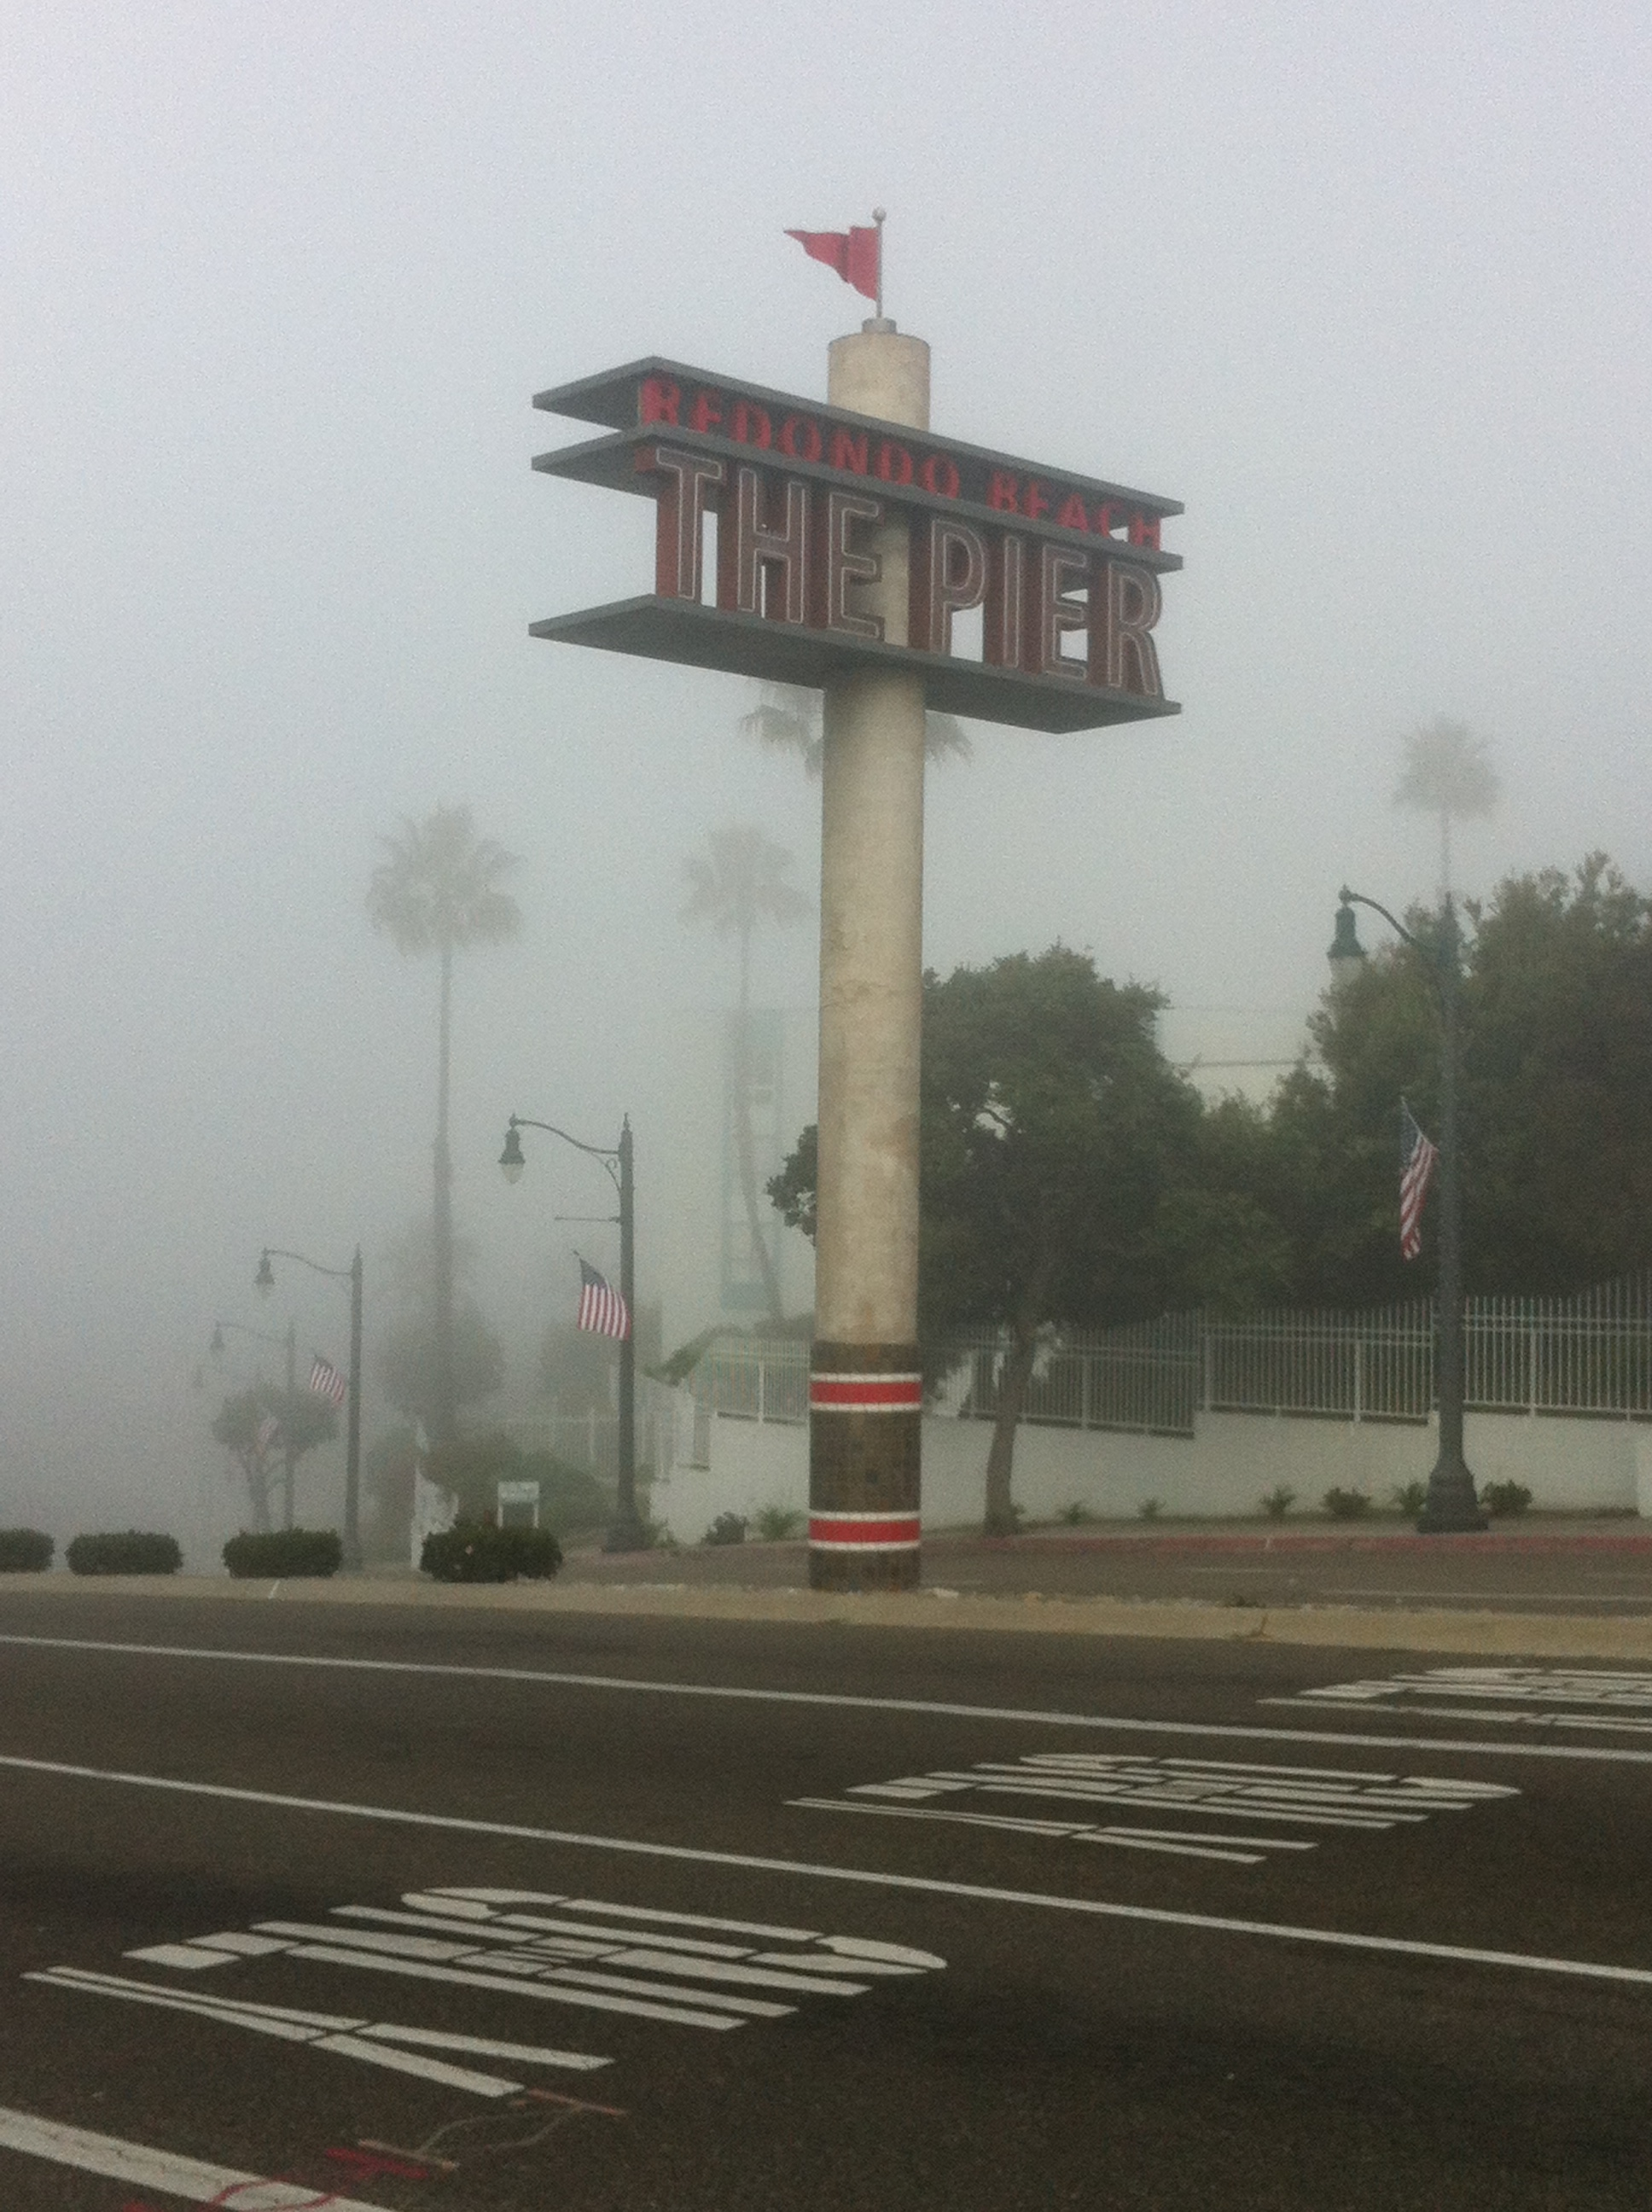 Redondo Beach Pier: Fog